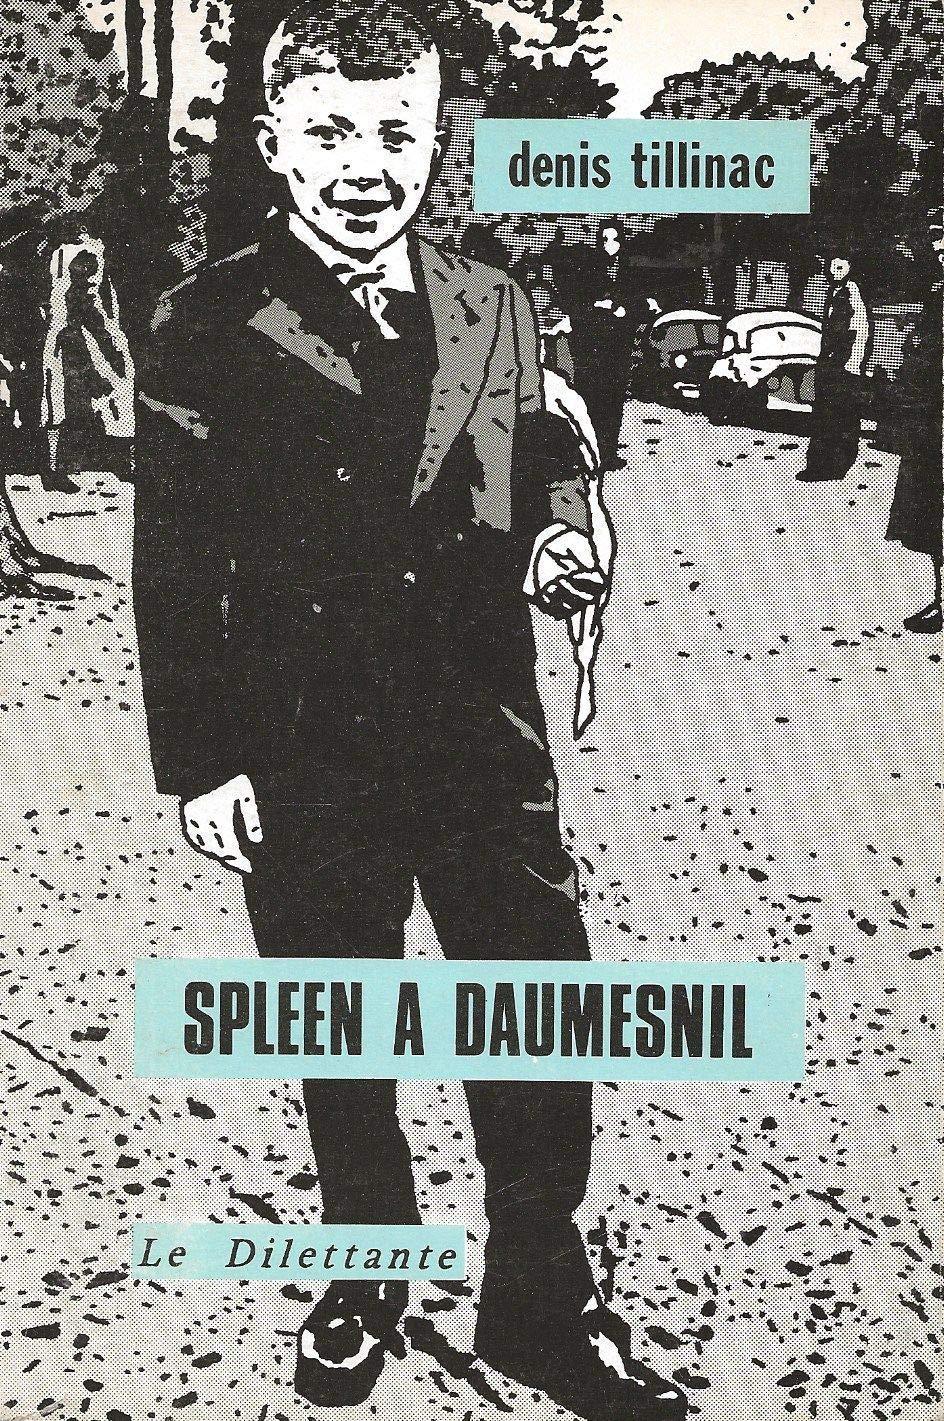 Spleen à Daumesnil